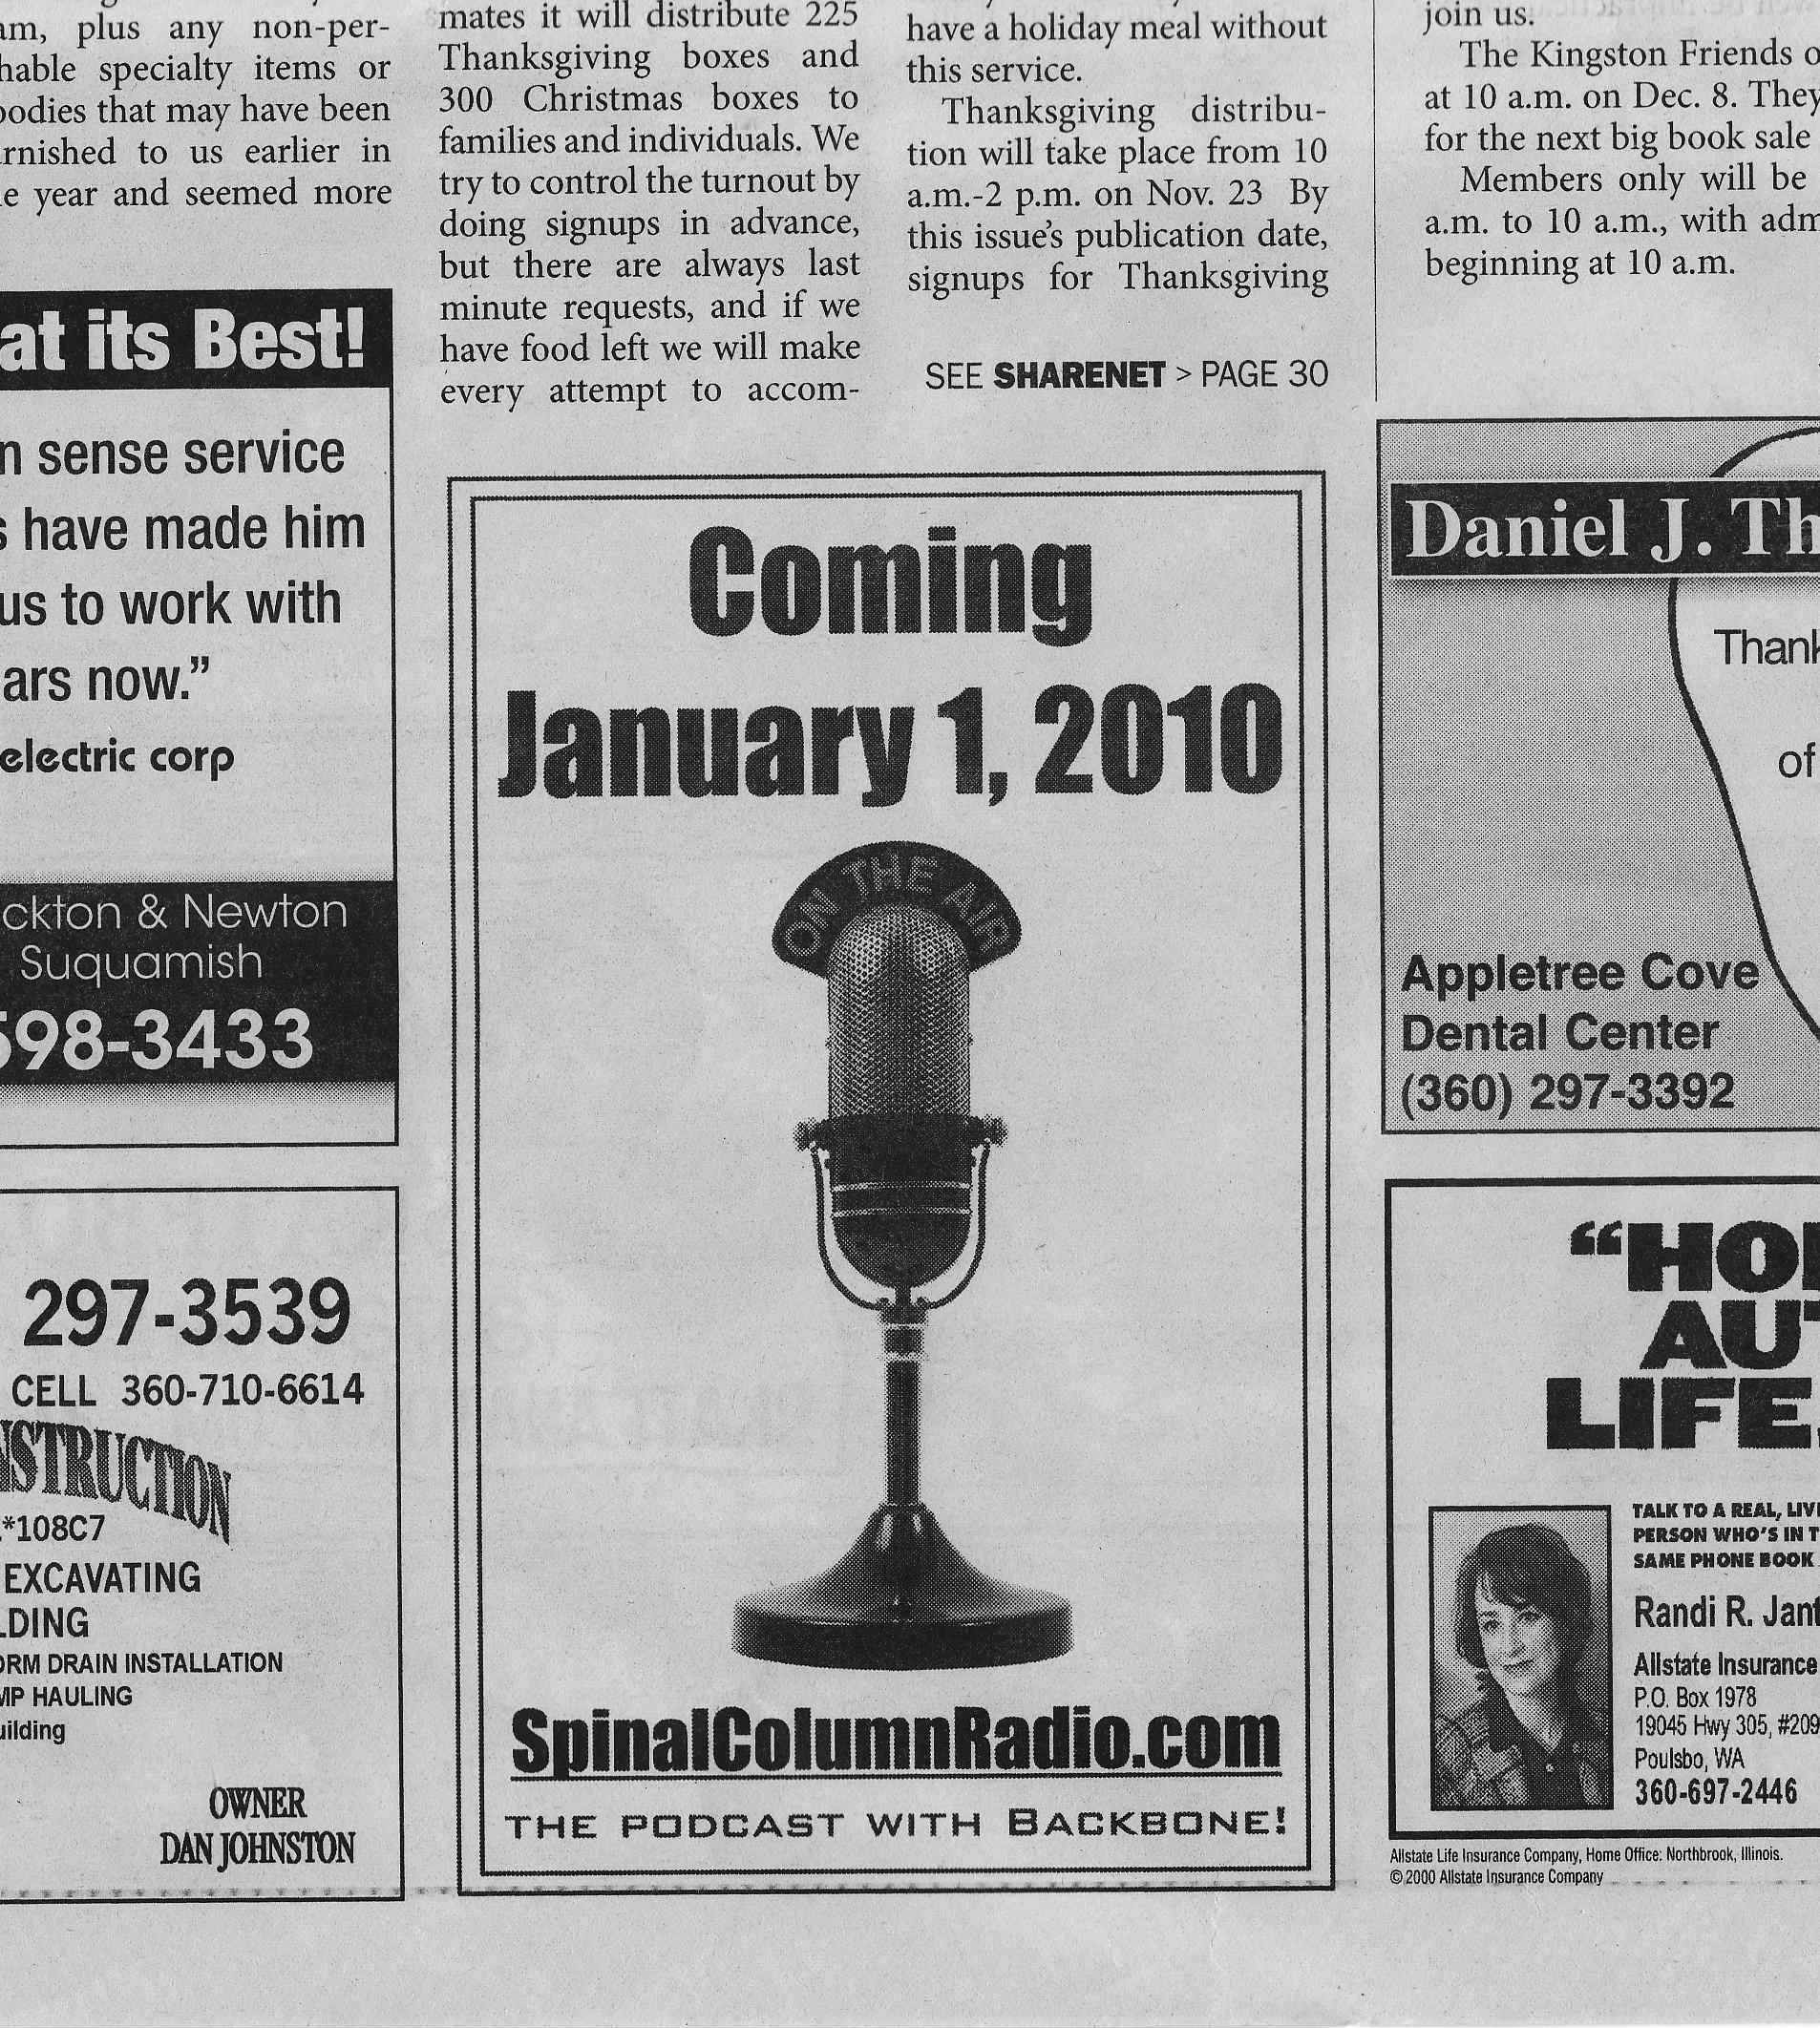 Promotional Bin SpinalColumnRadio